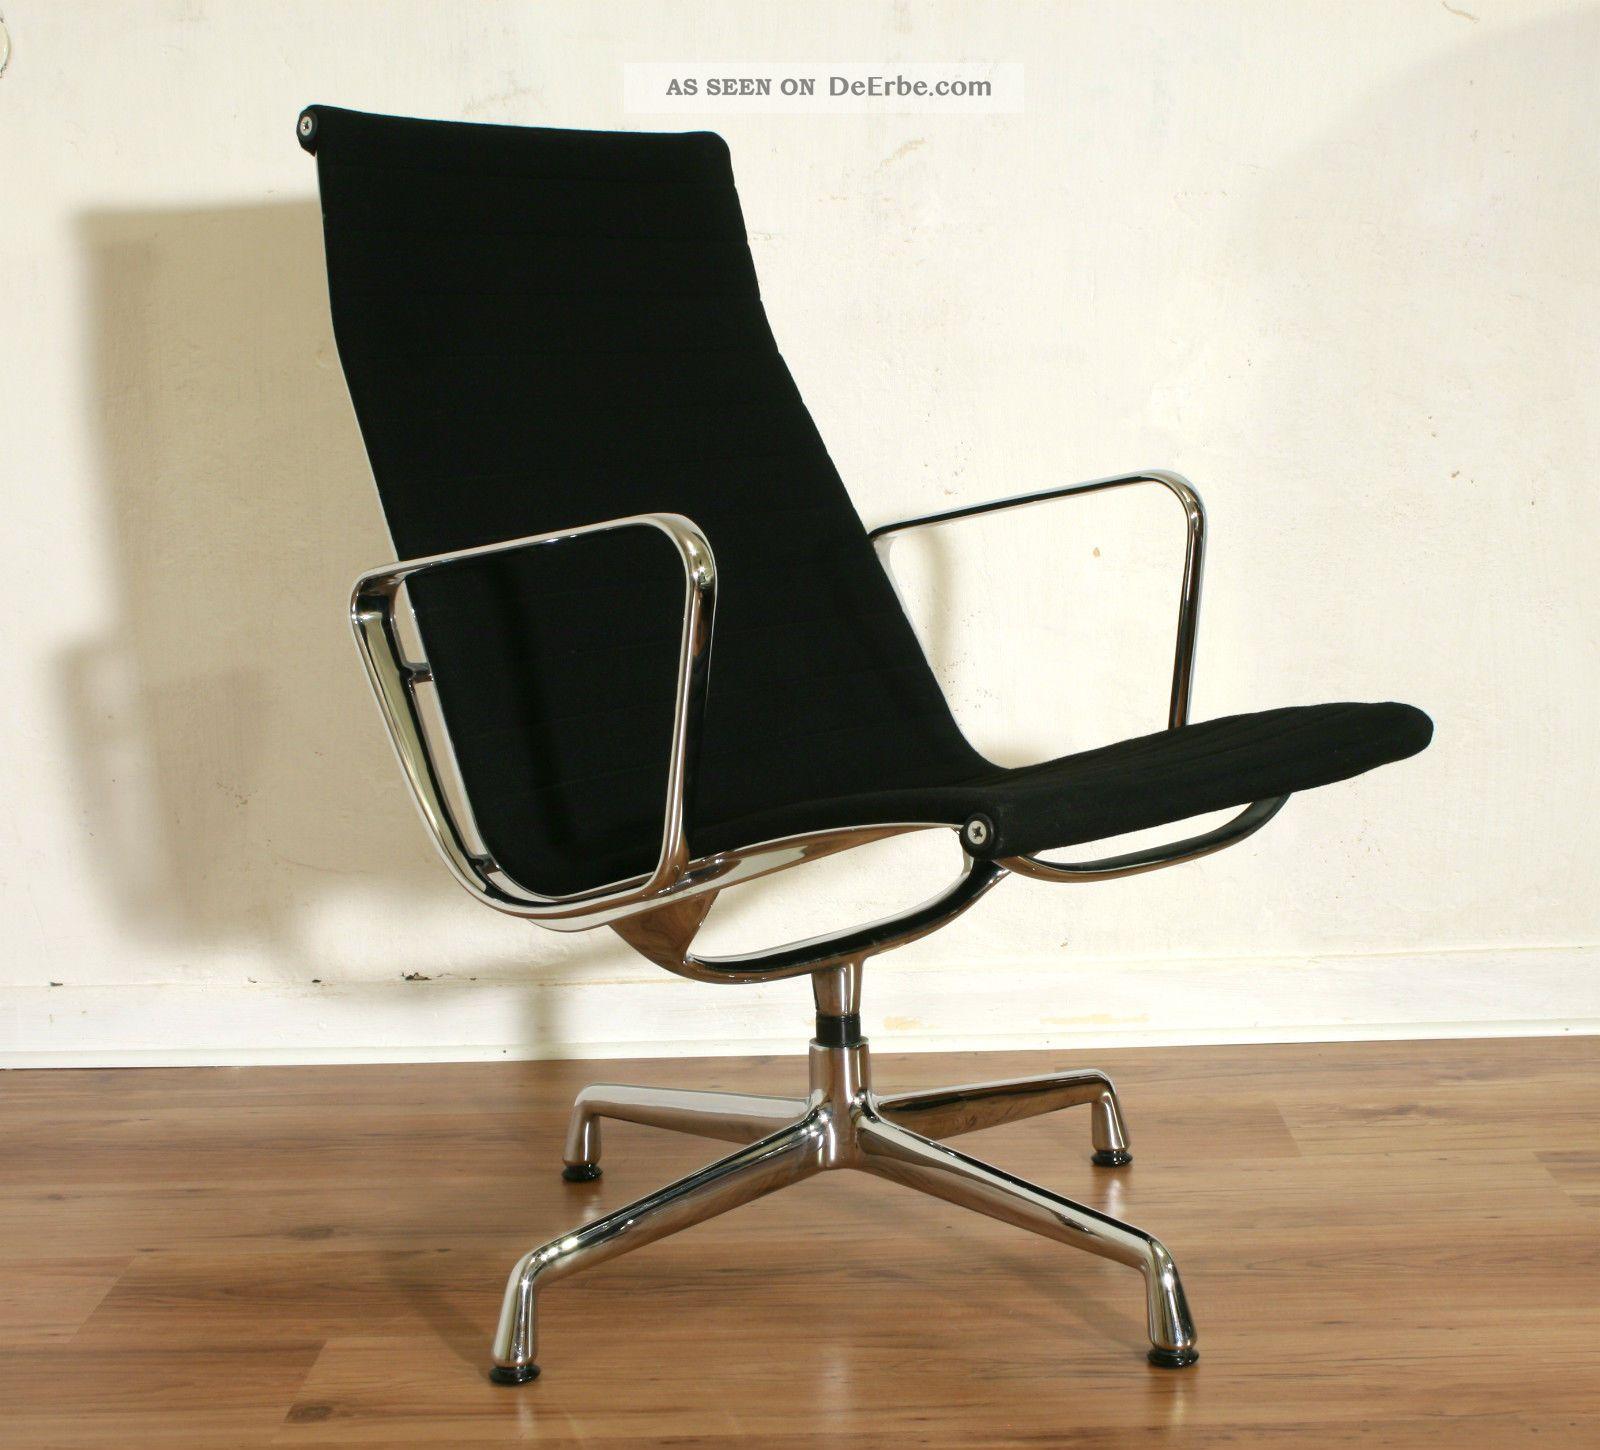 Vitra alu chair ea 116 design charles eames hopsak for Vitra alu chair replica